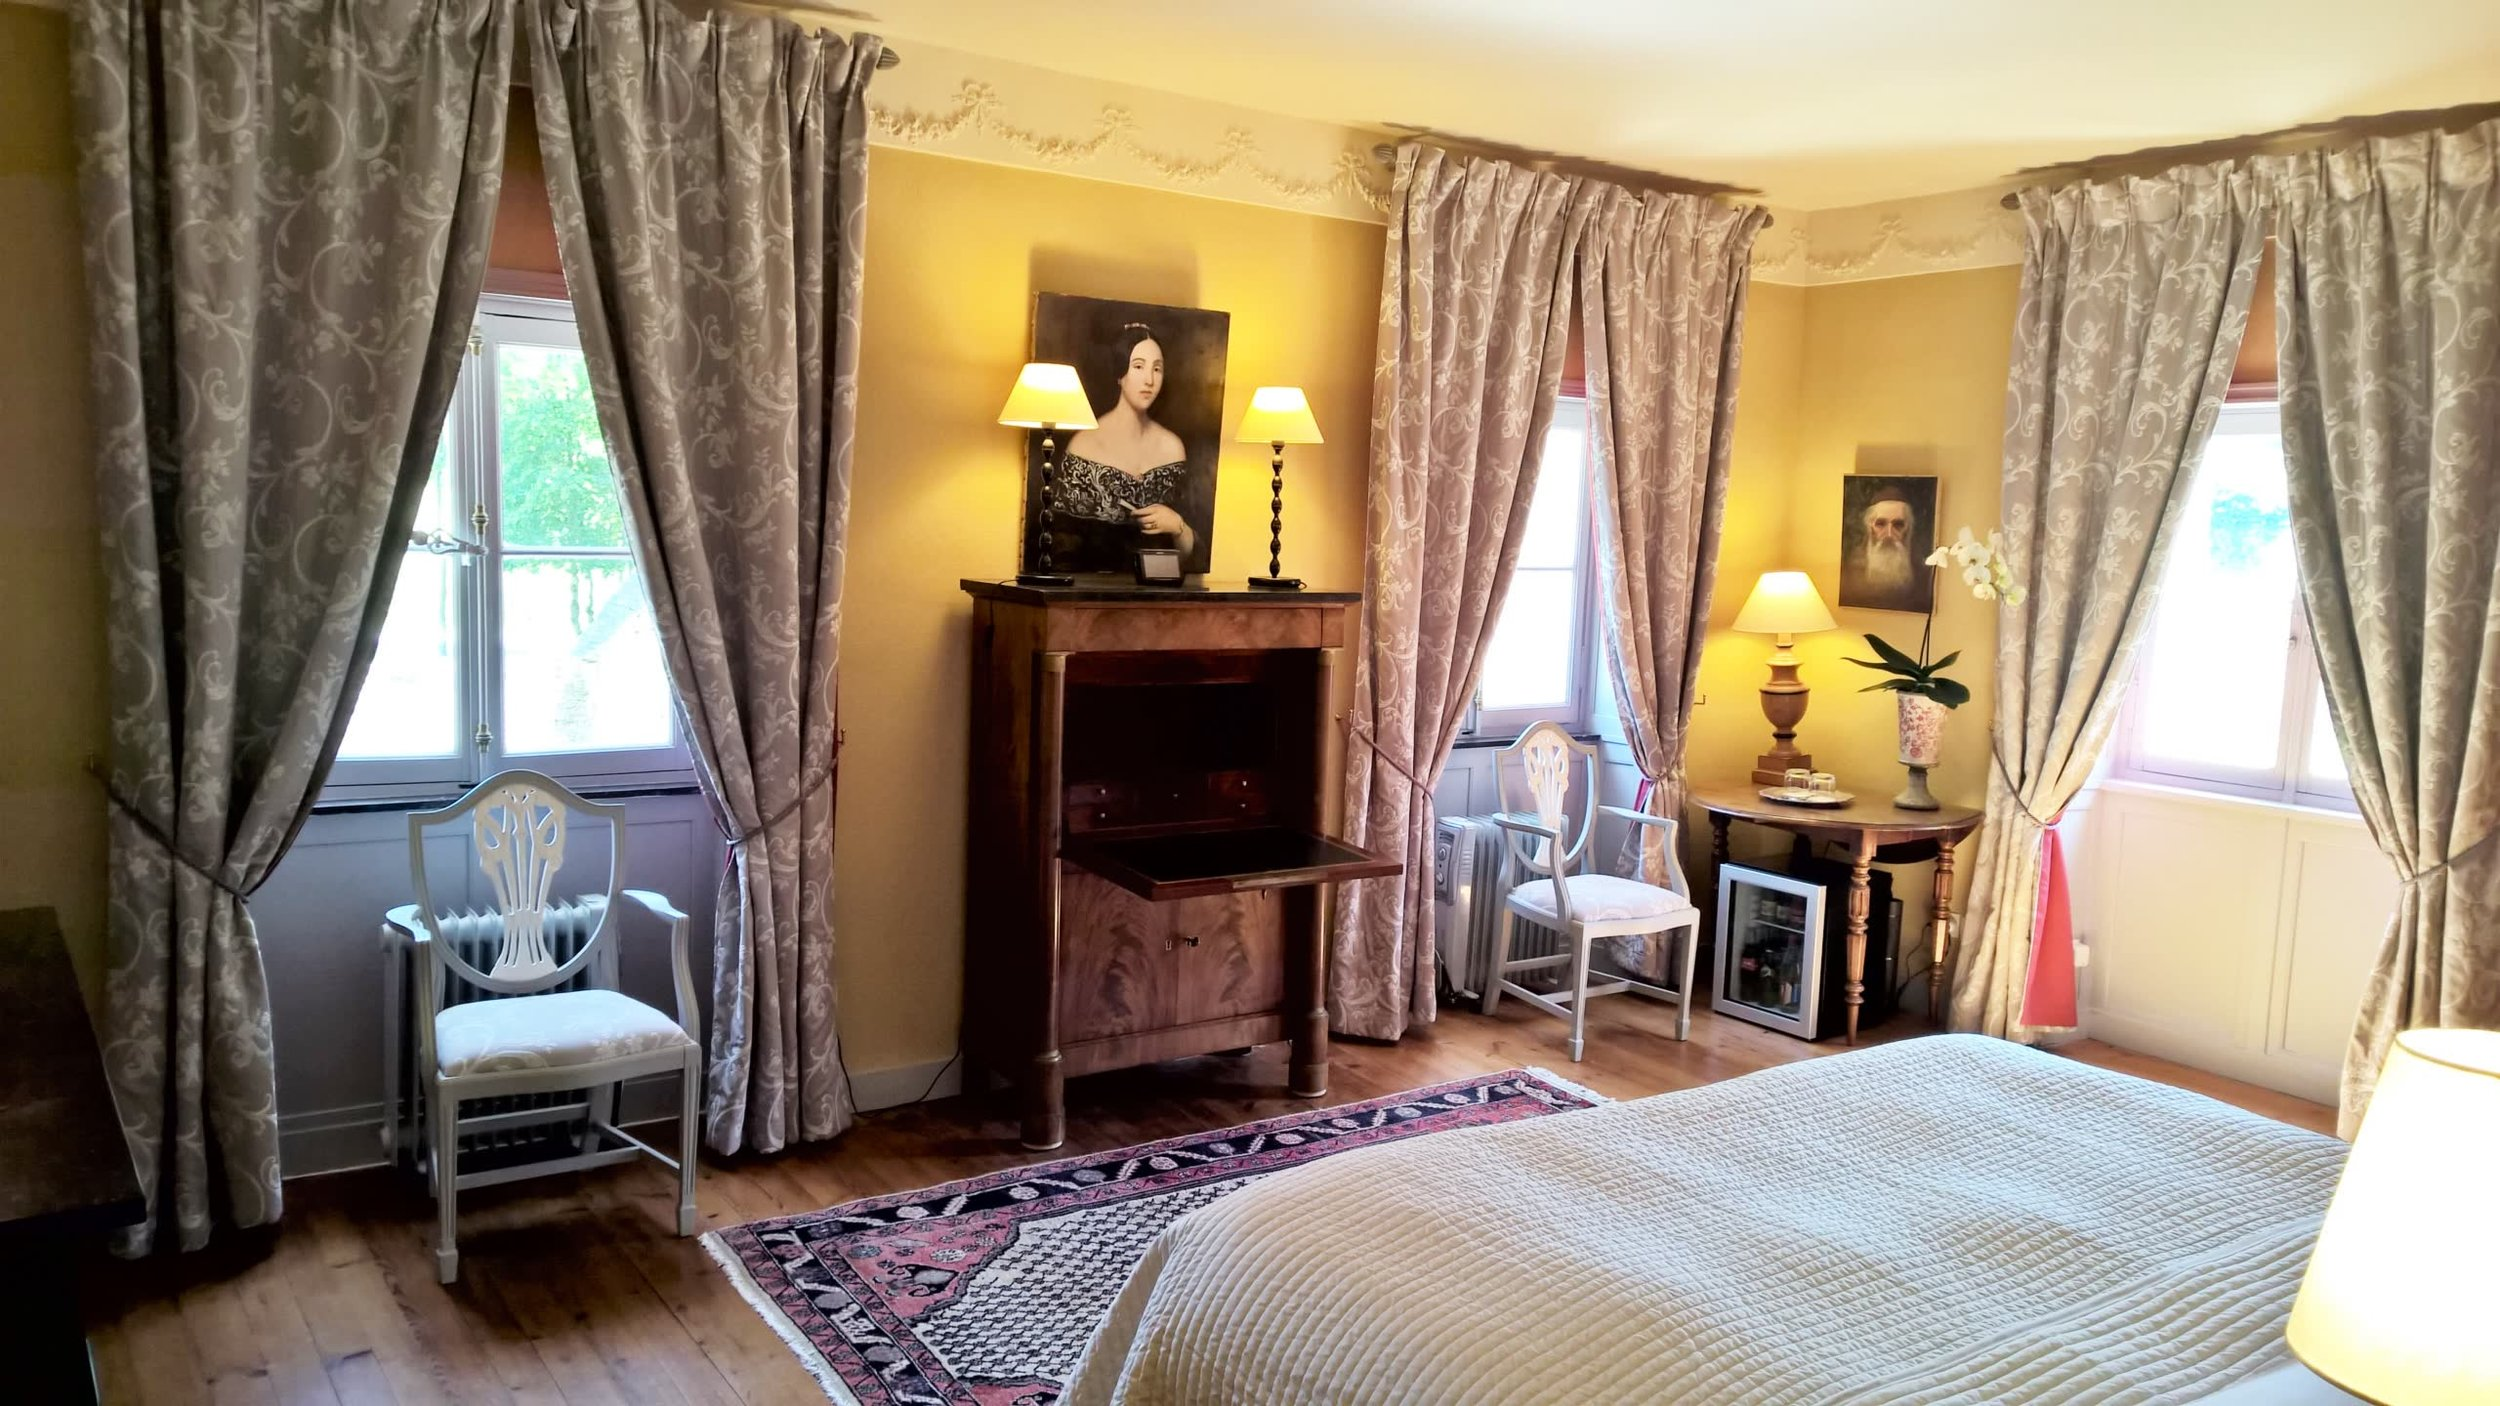 Chateau de la Pommeraye - charming boutique hotel chateau b&b spa normandy calvados bedroom Levants 5(3).jpg